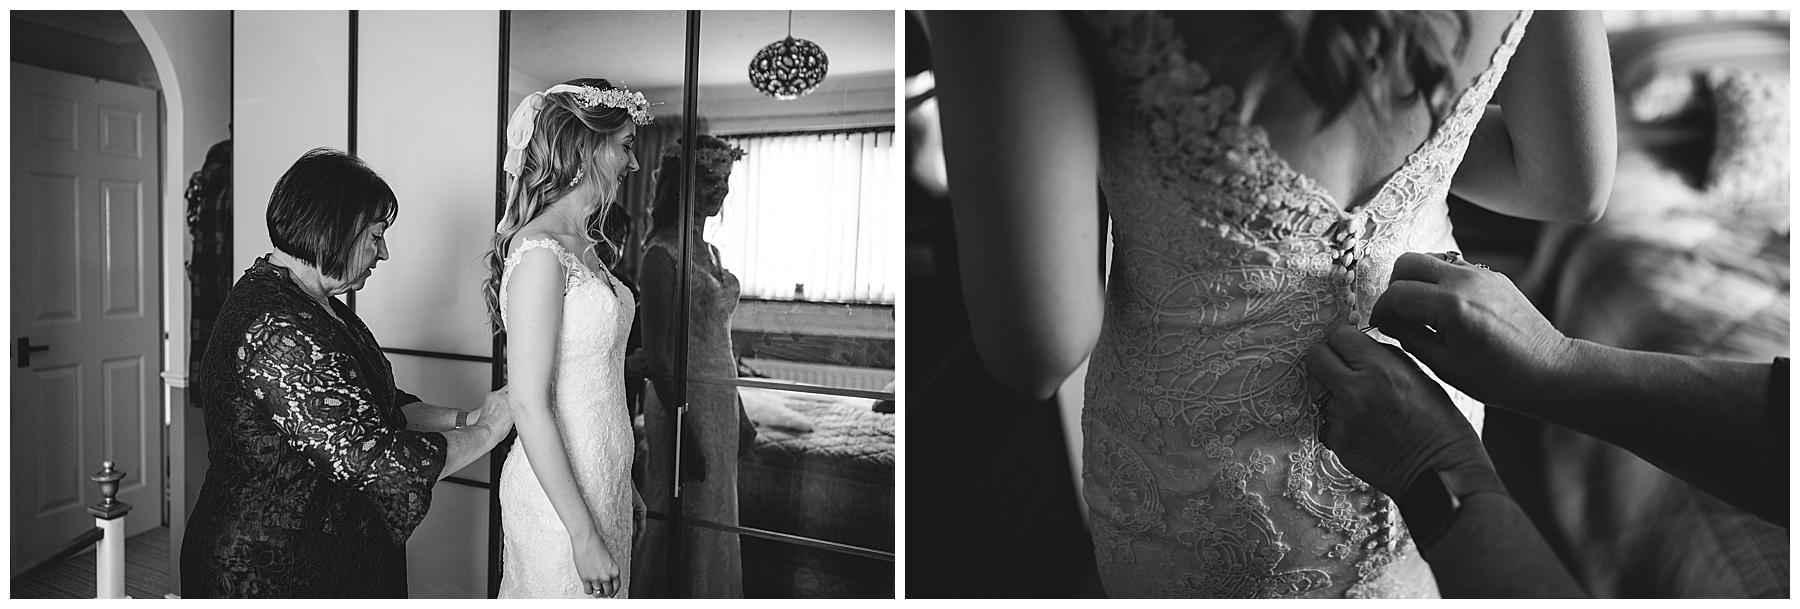 Bridal Preparations Photography